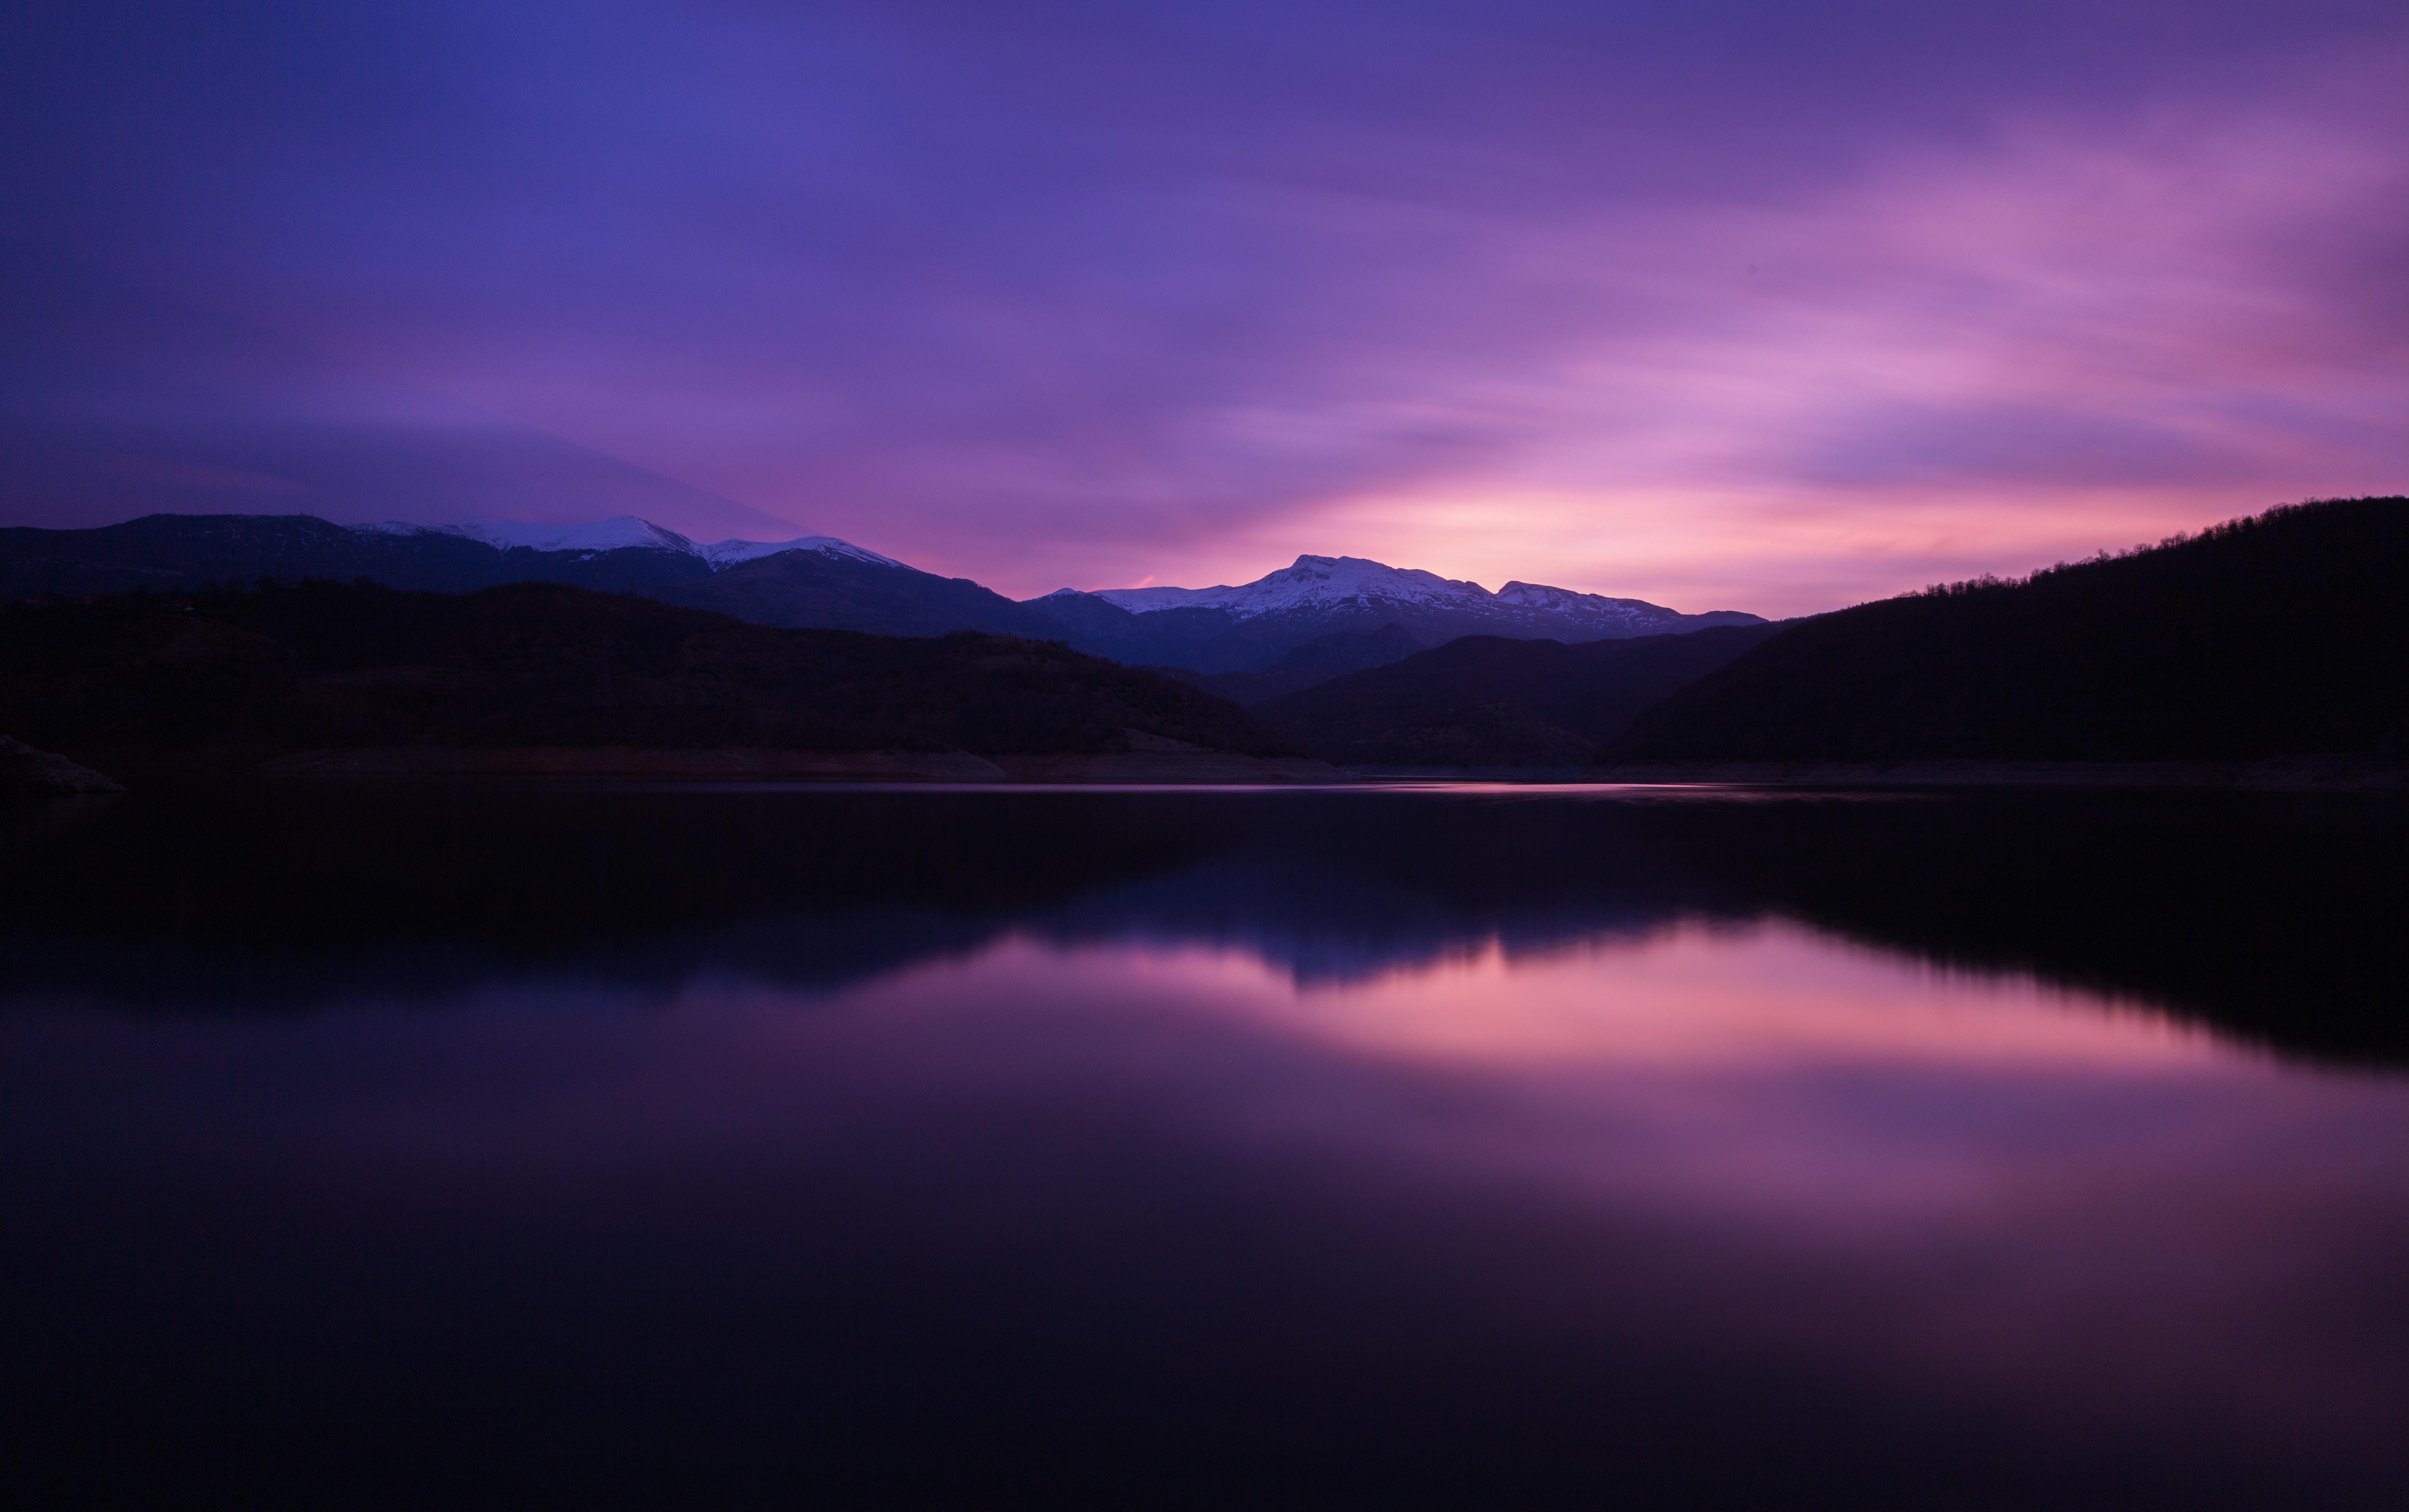 Mountain lake night reflection 5k hd nature 4k - Night mountain wallpaper 4k ...